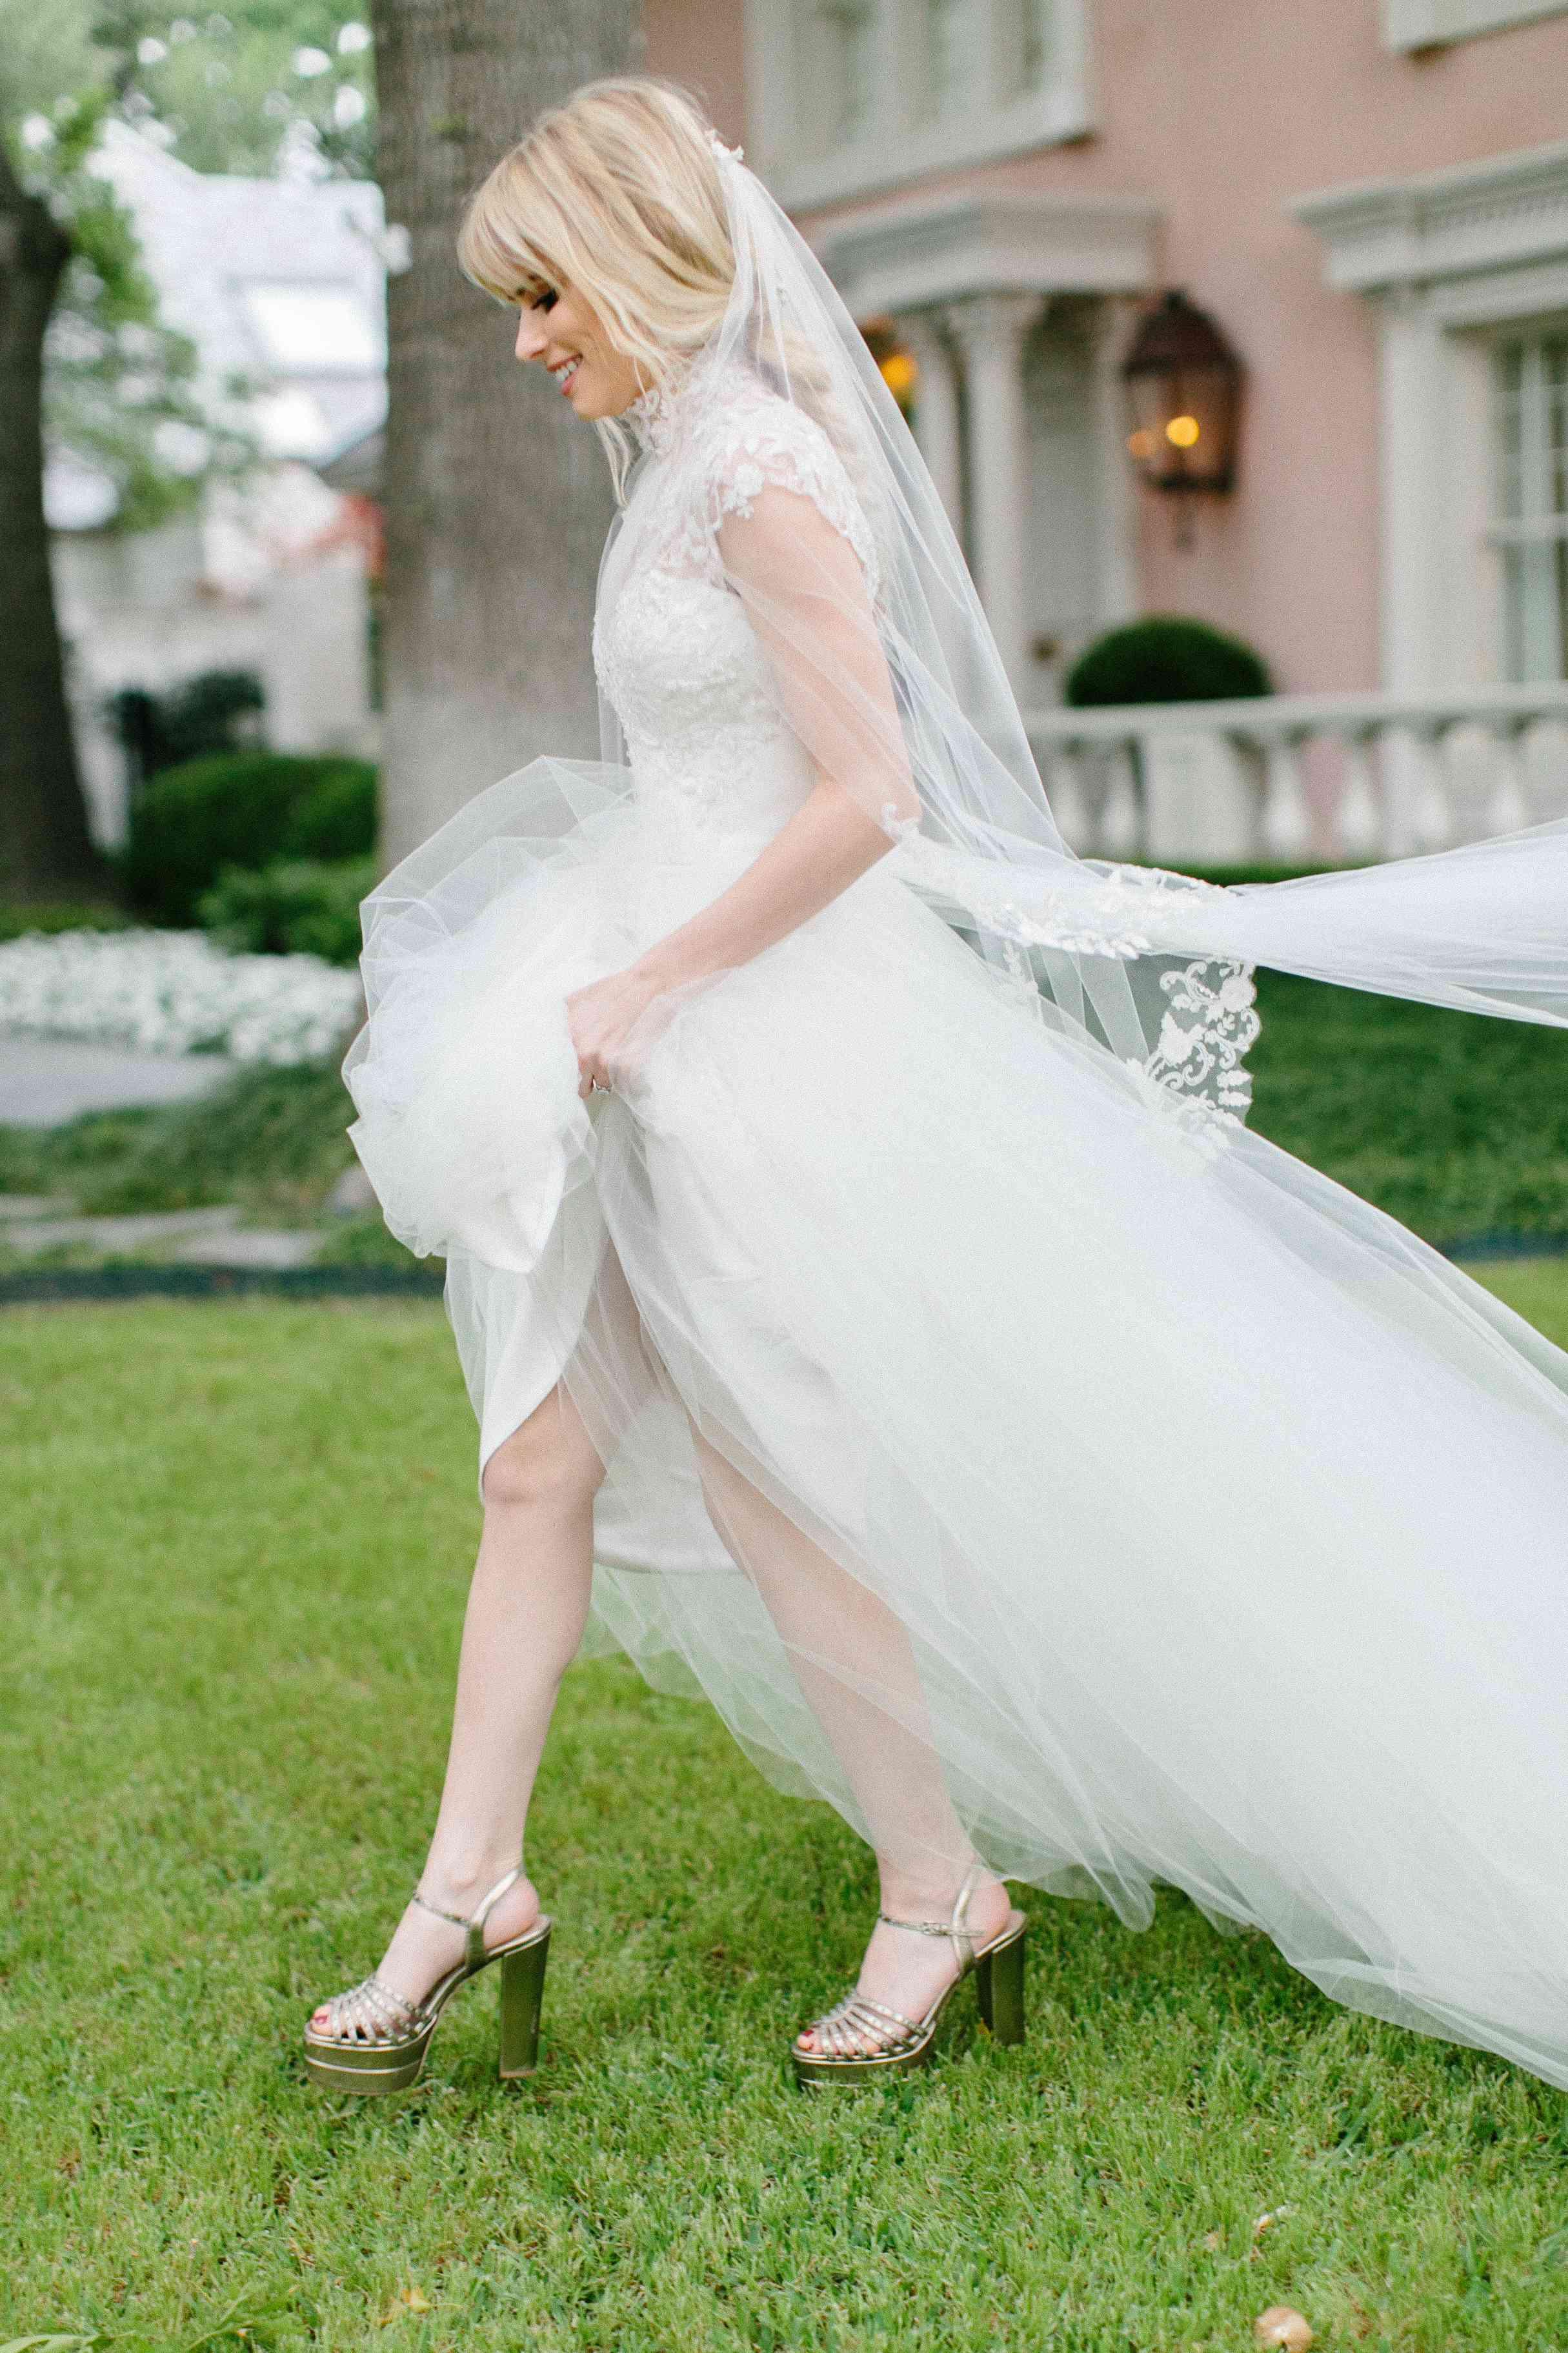 <p>Christian Siriano Wedding Dress</p><br><br>